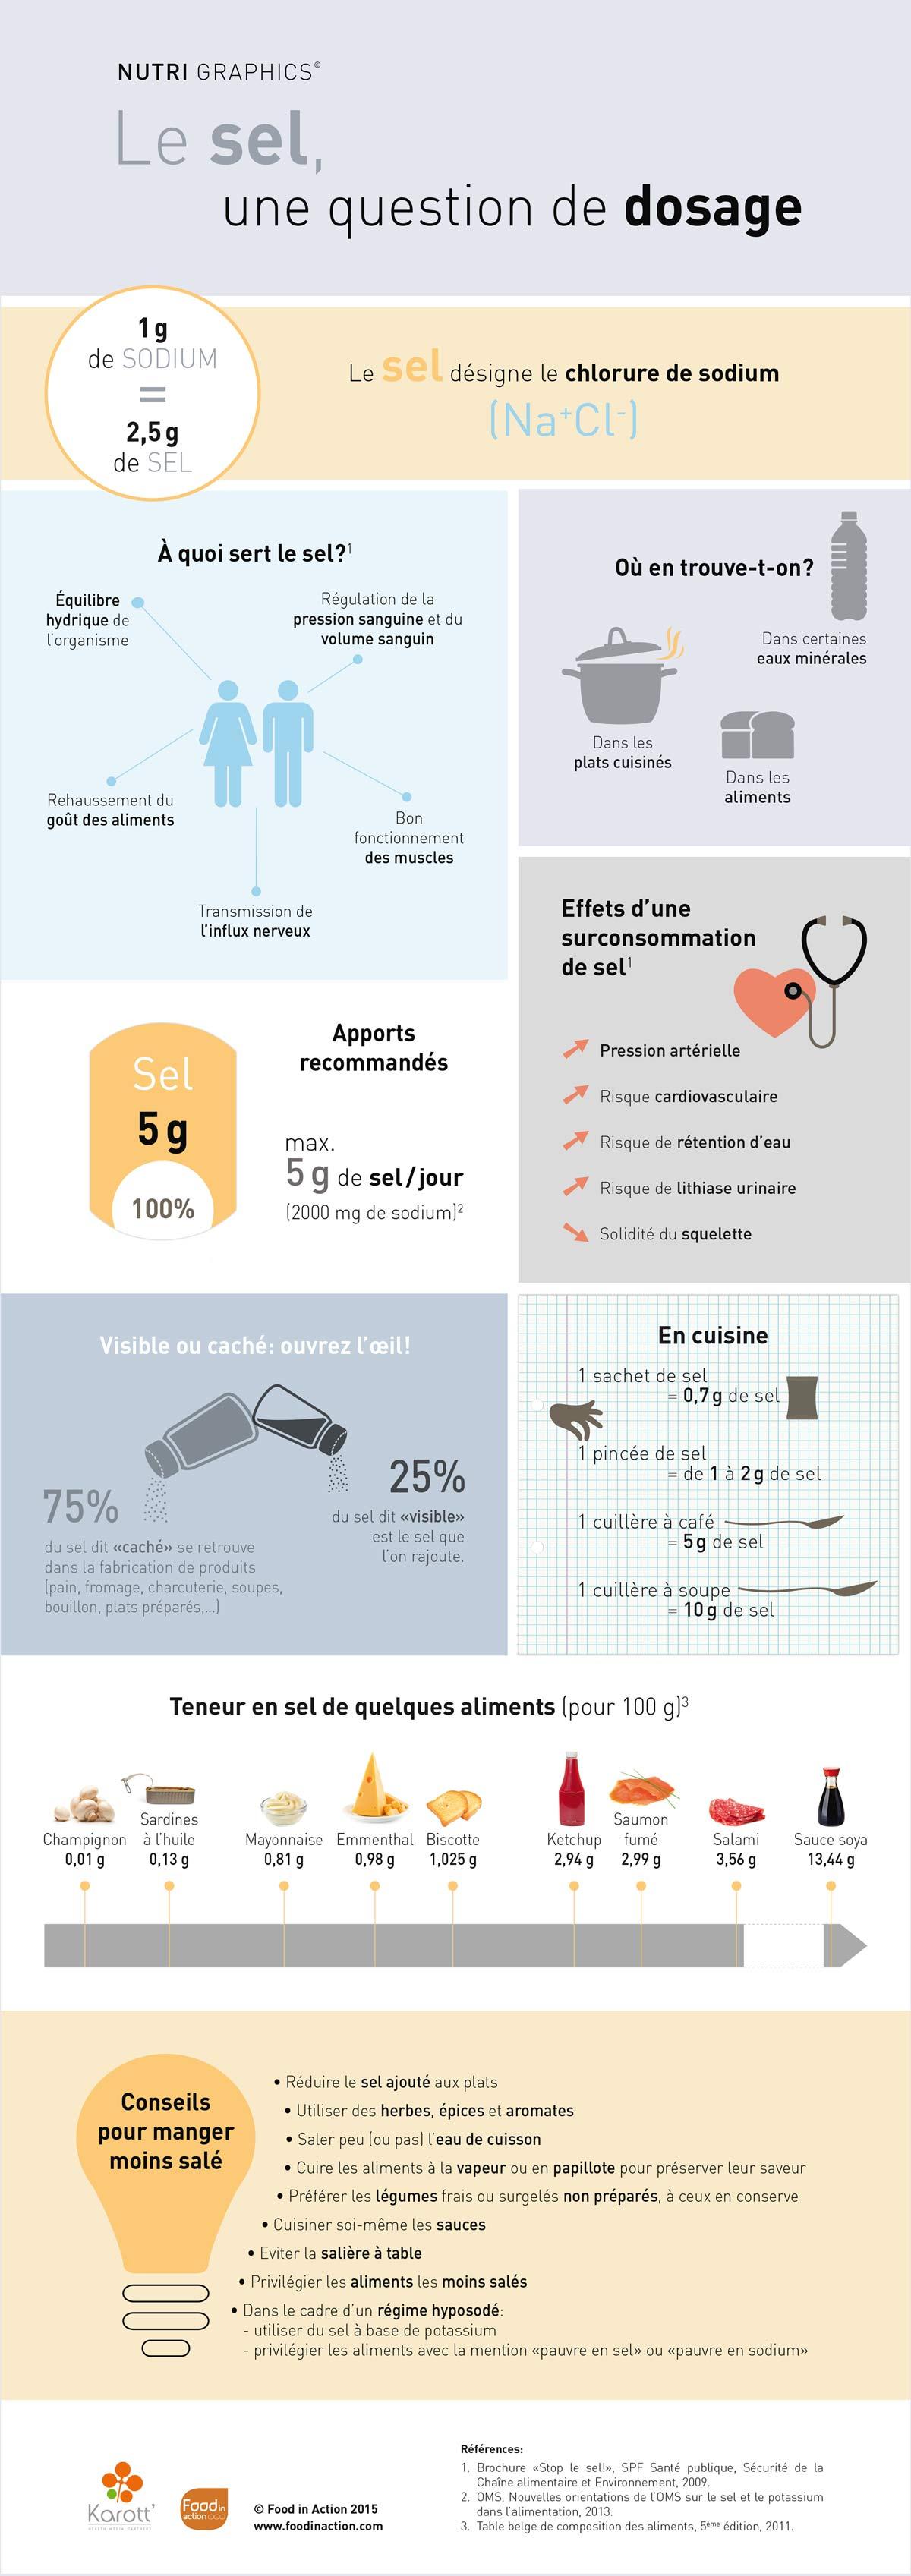 nutrigraphics-sel-dosage